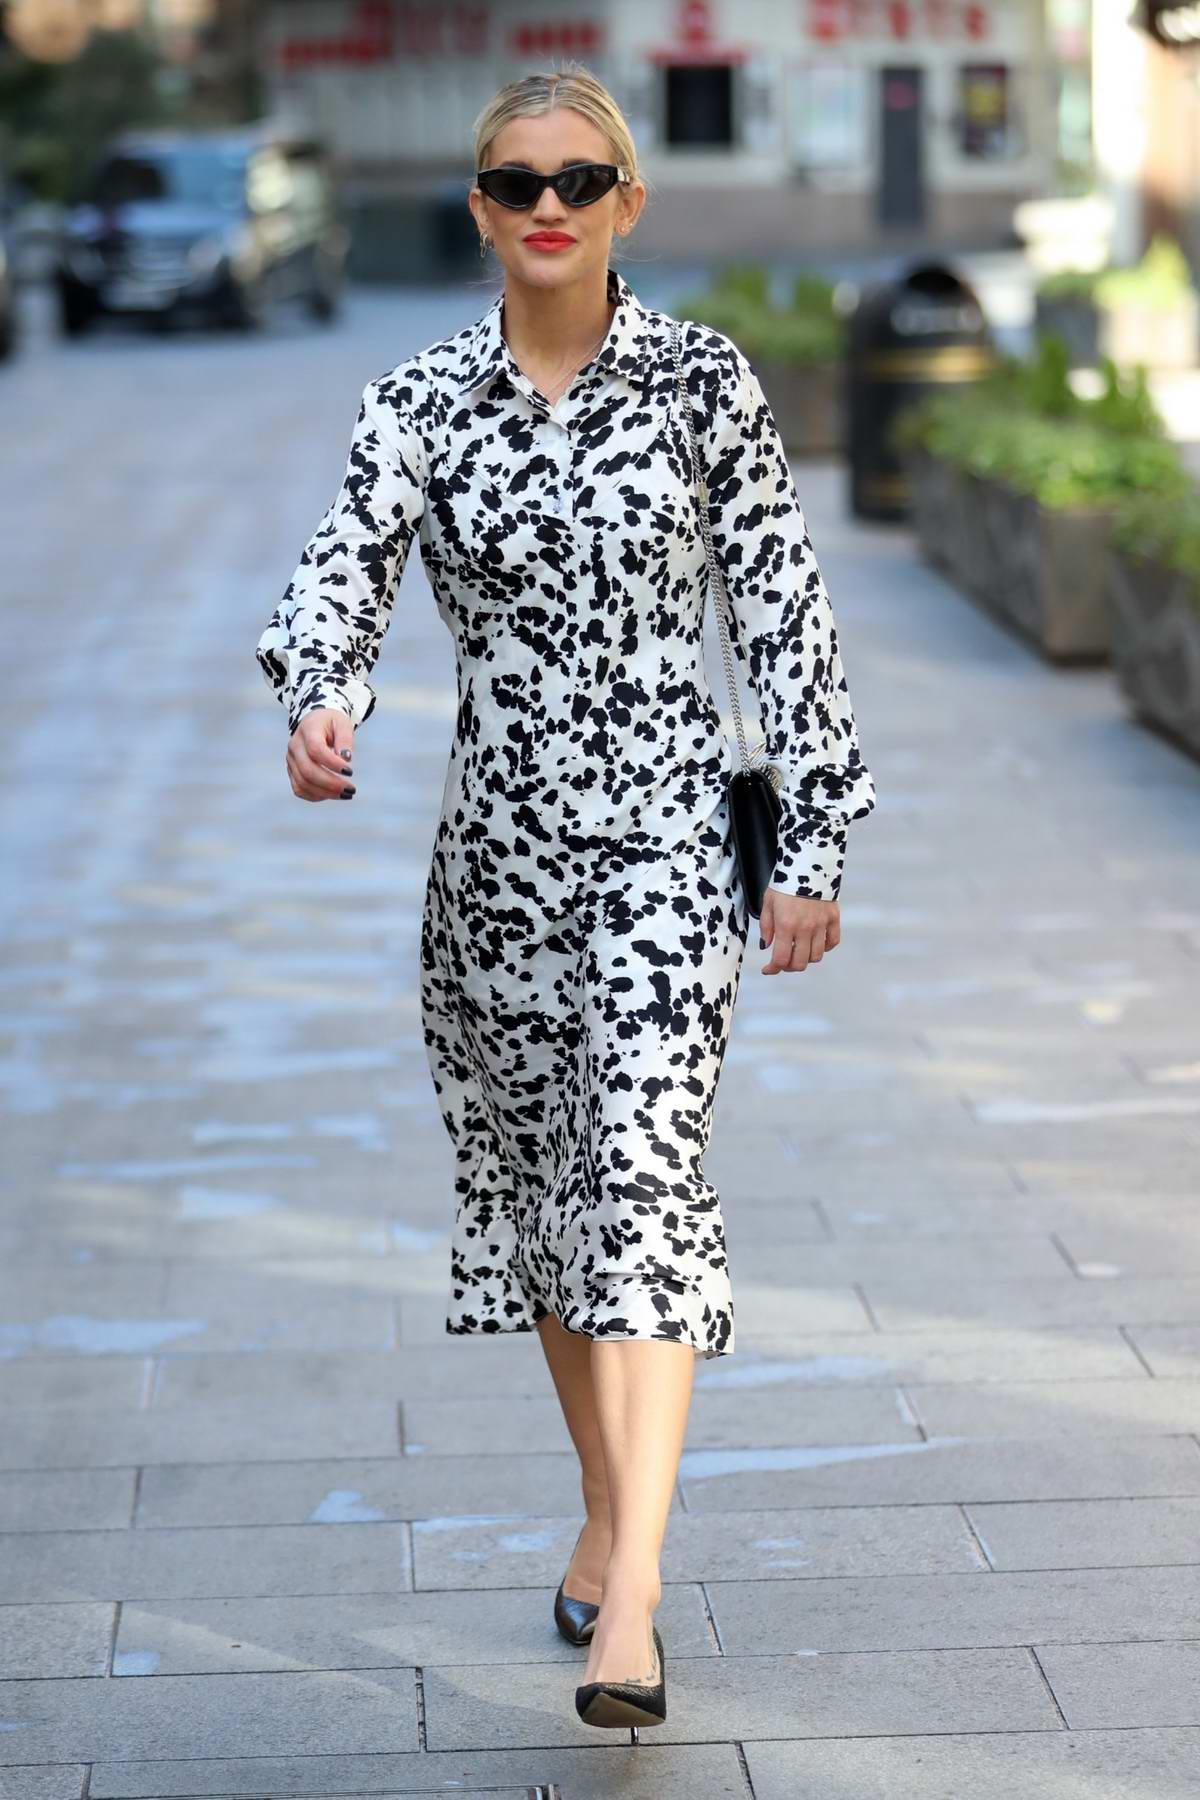 Ashley Roberts looks great in Dalmatian print dress as she leaves Heart Radio in London, UK